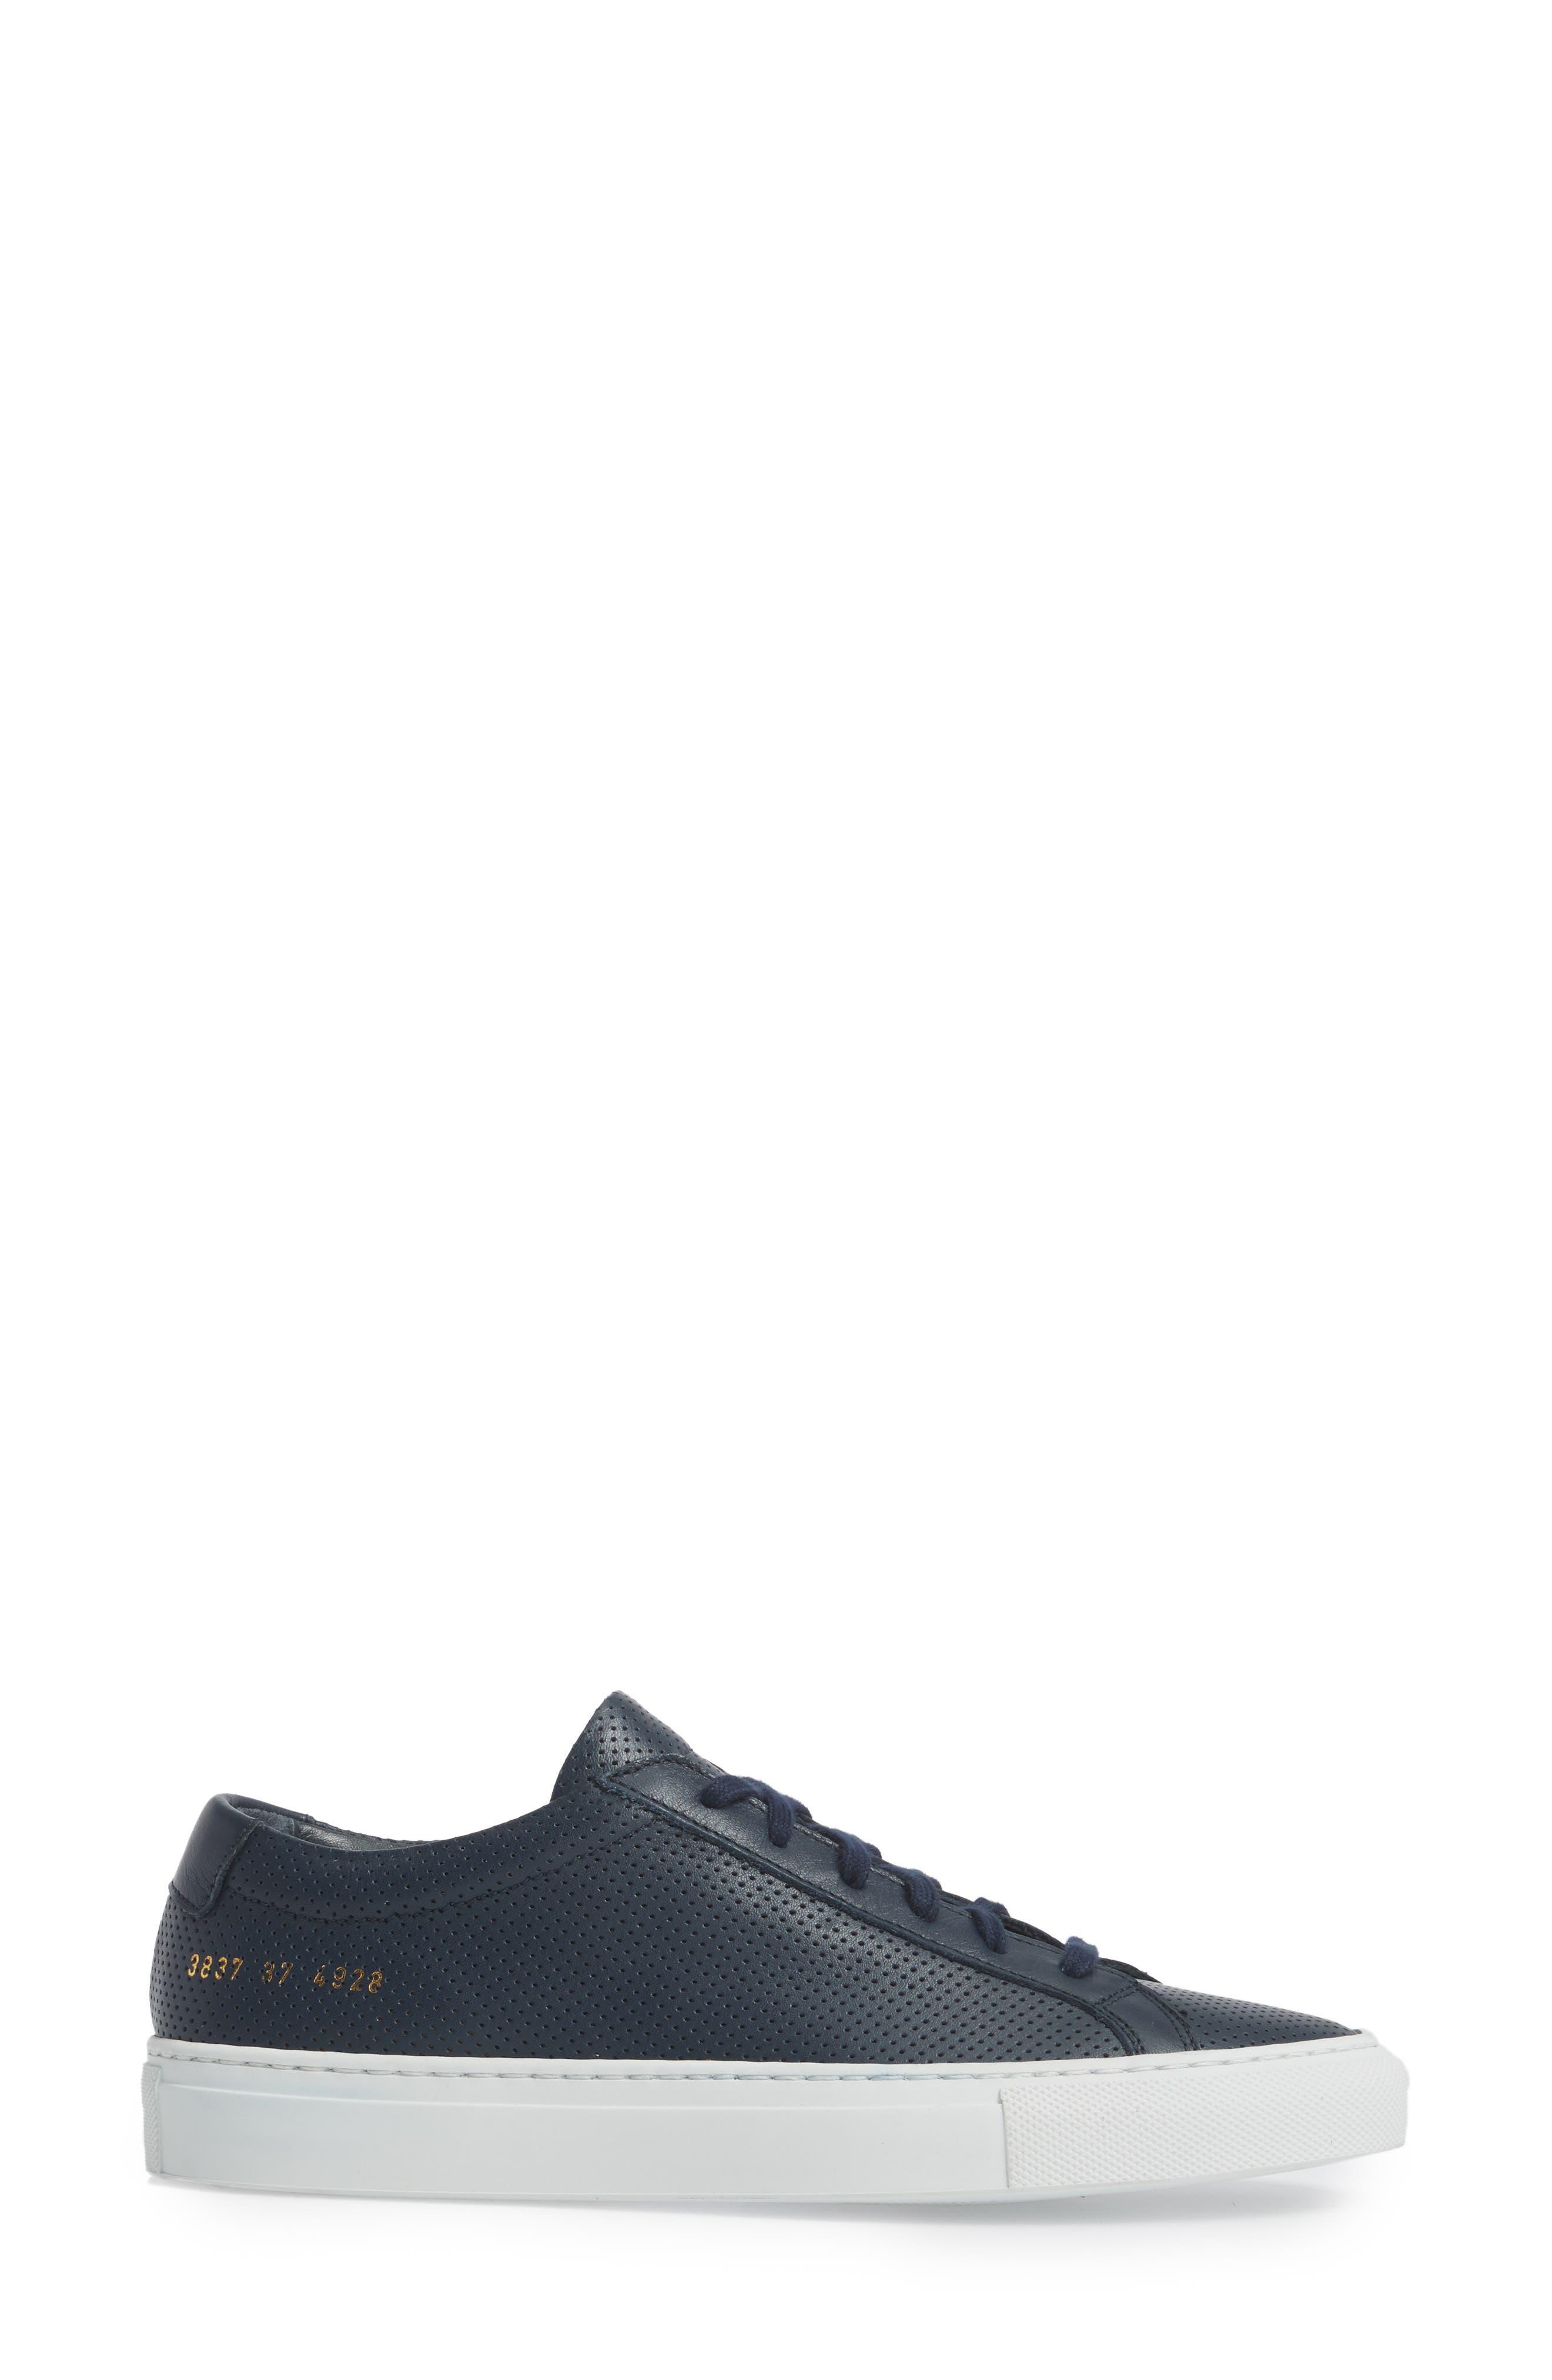 Original Achilles Perforated Low Sneaker,                             Alternate thumbnail 3, color,                             400